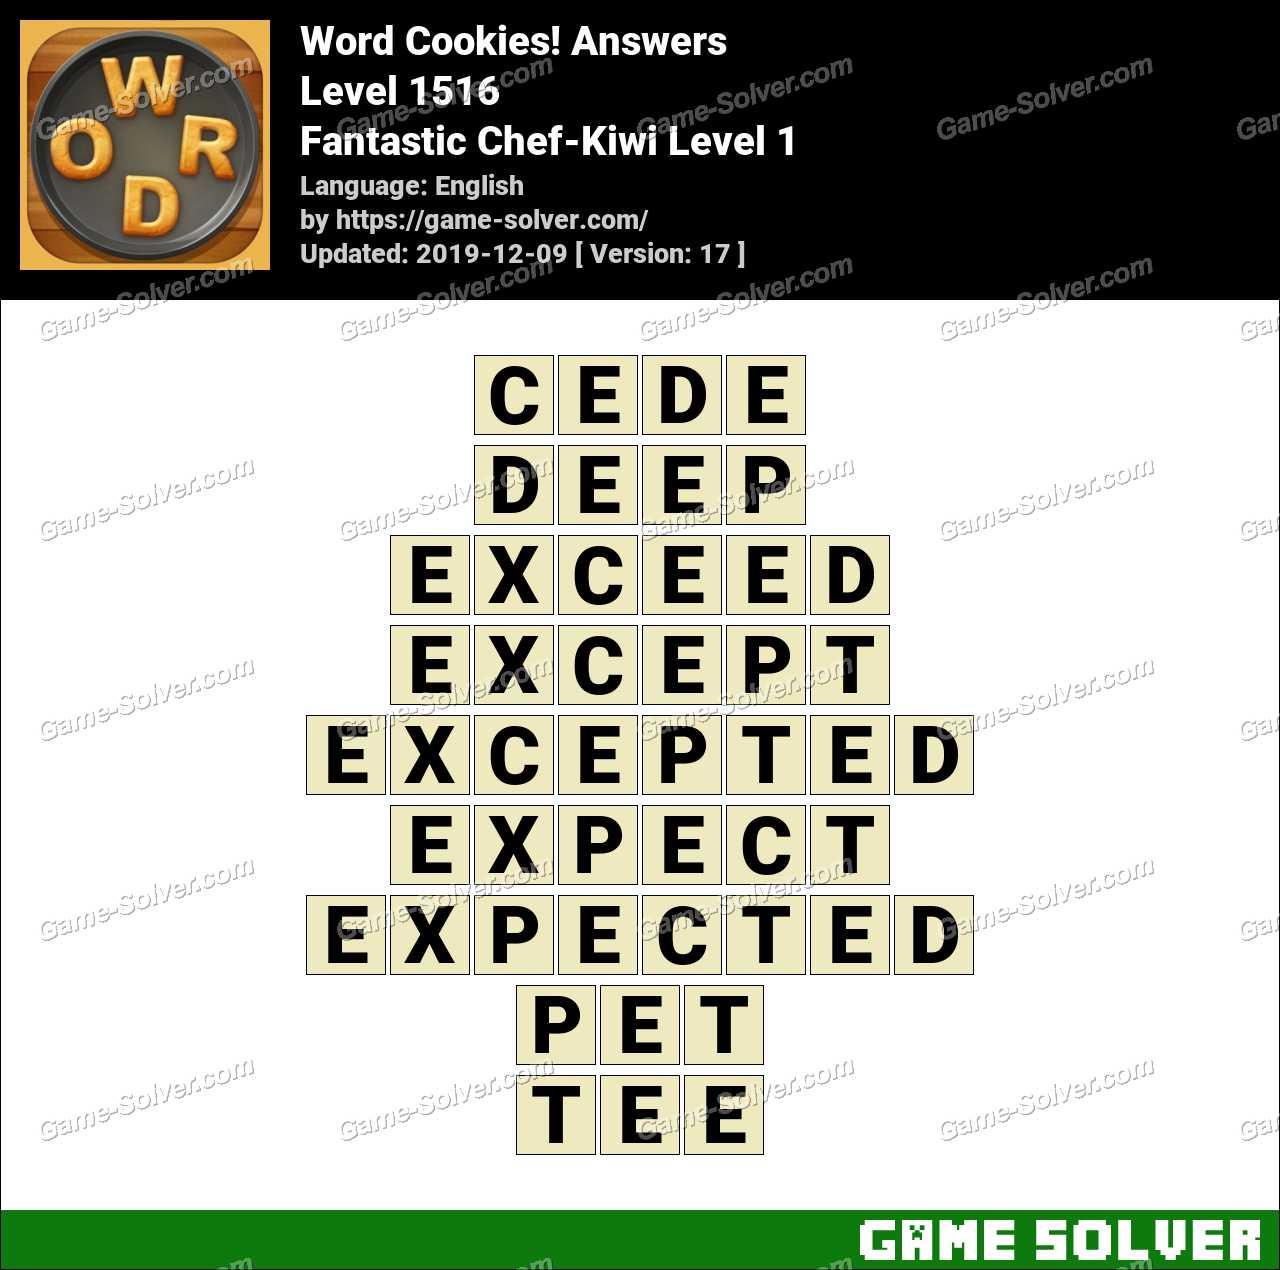 Word Cookies Fantastic Chef-Kiwi Level 1 Answers